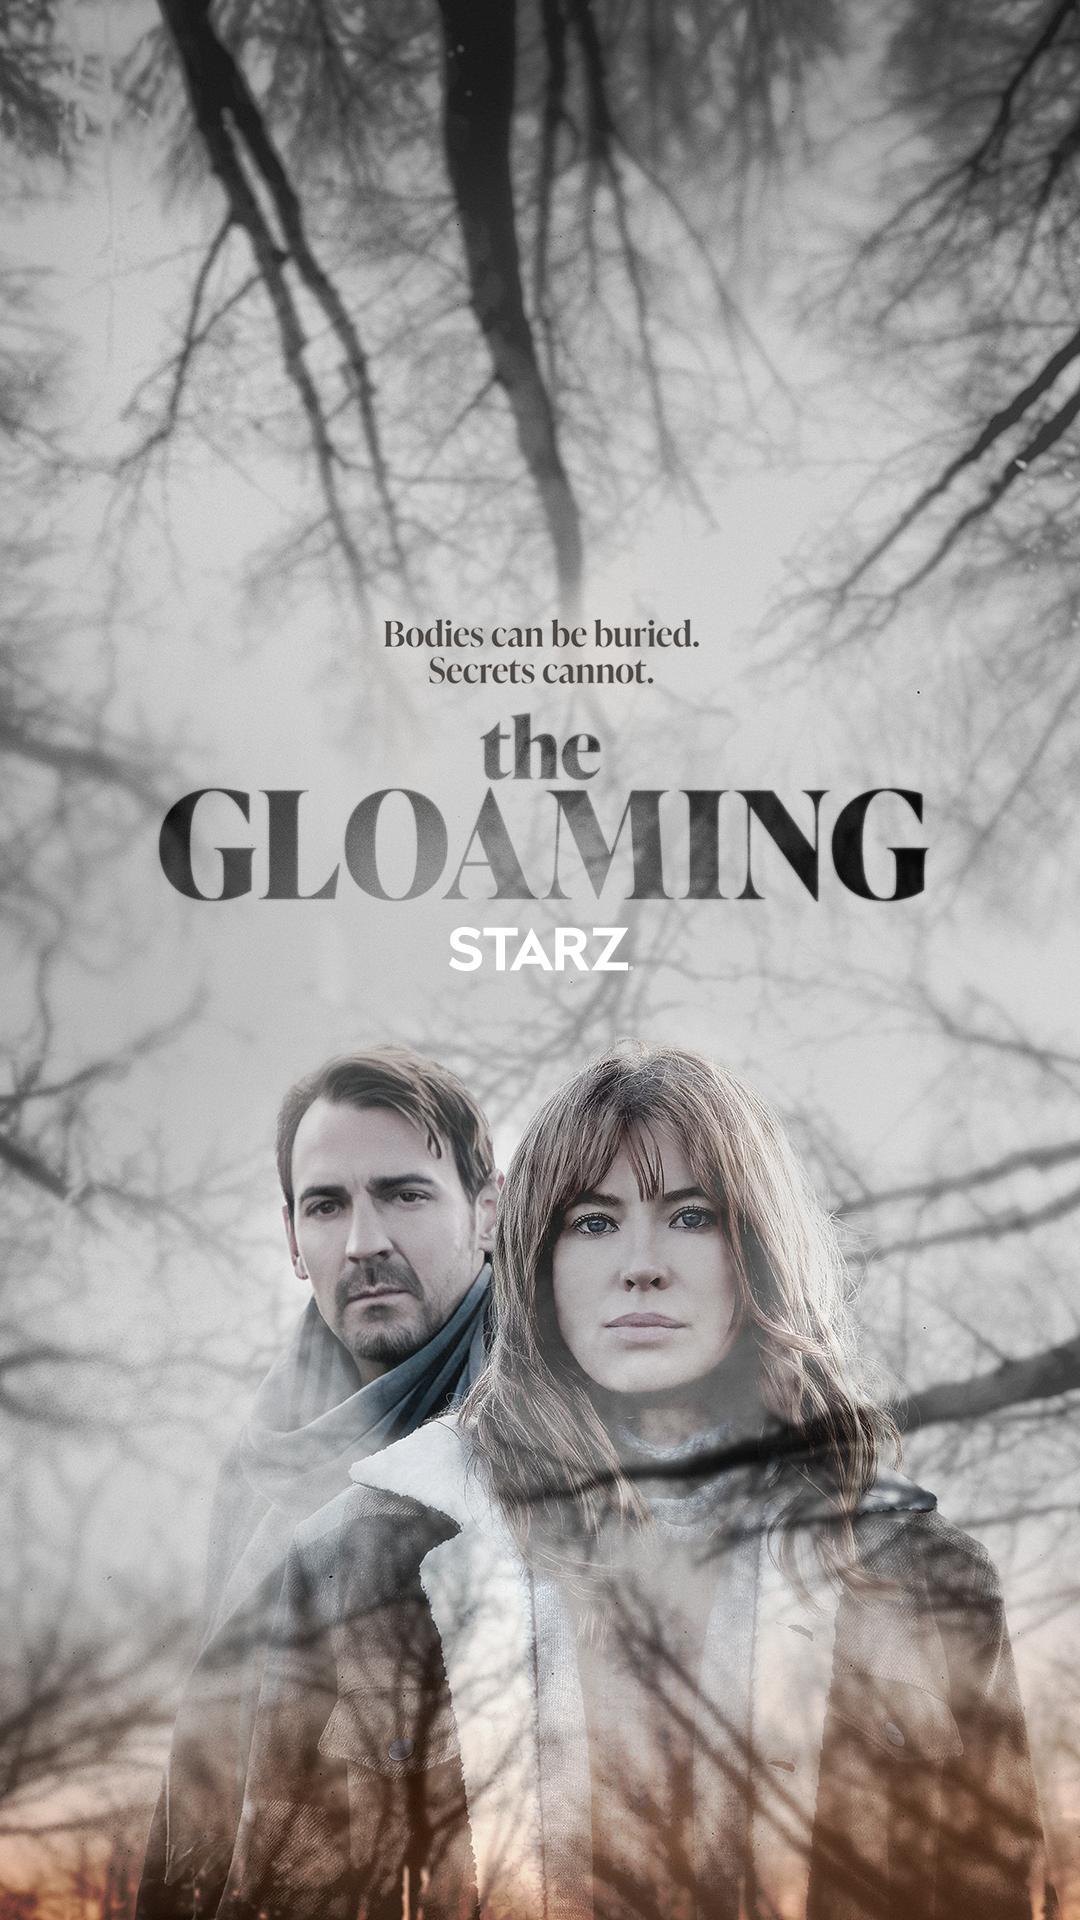 The Gloaming - new starz series